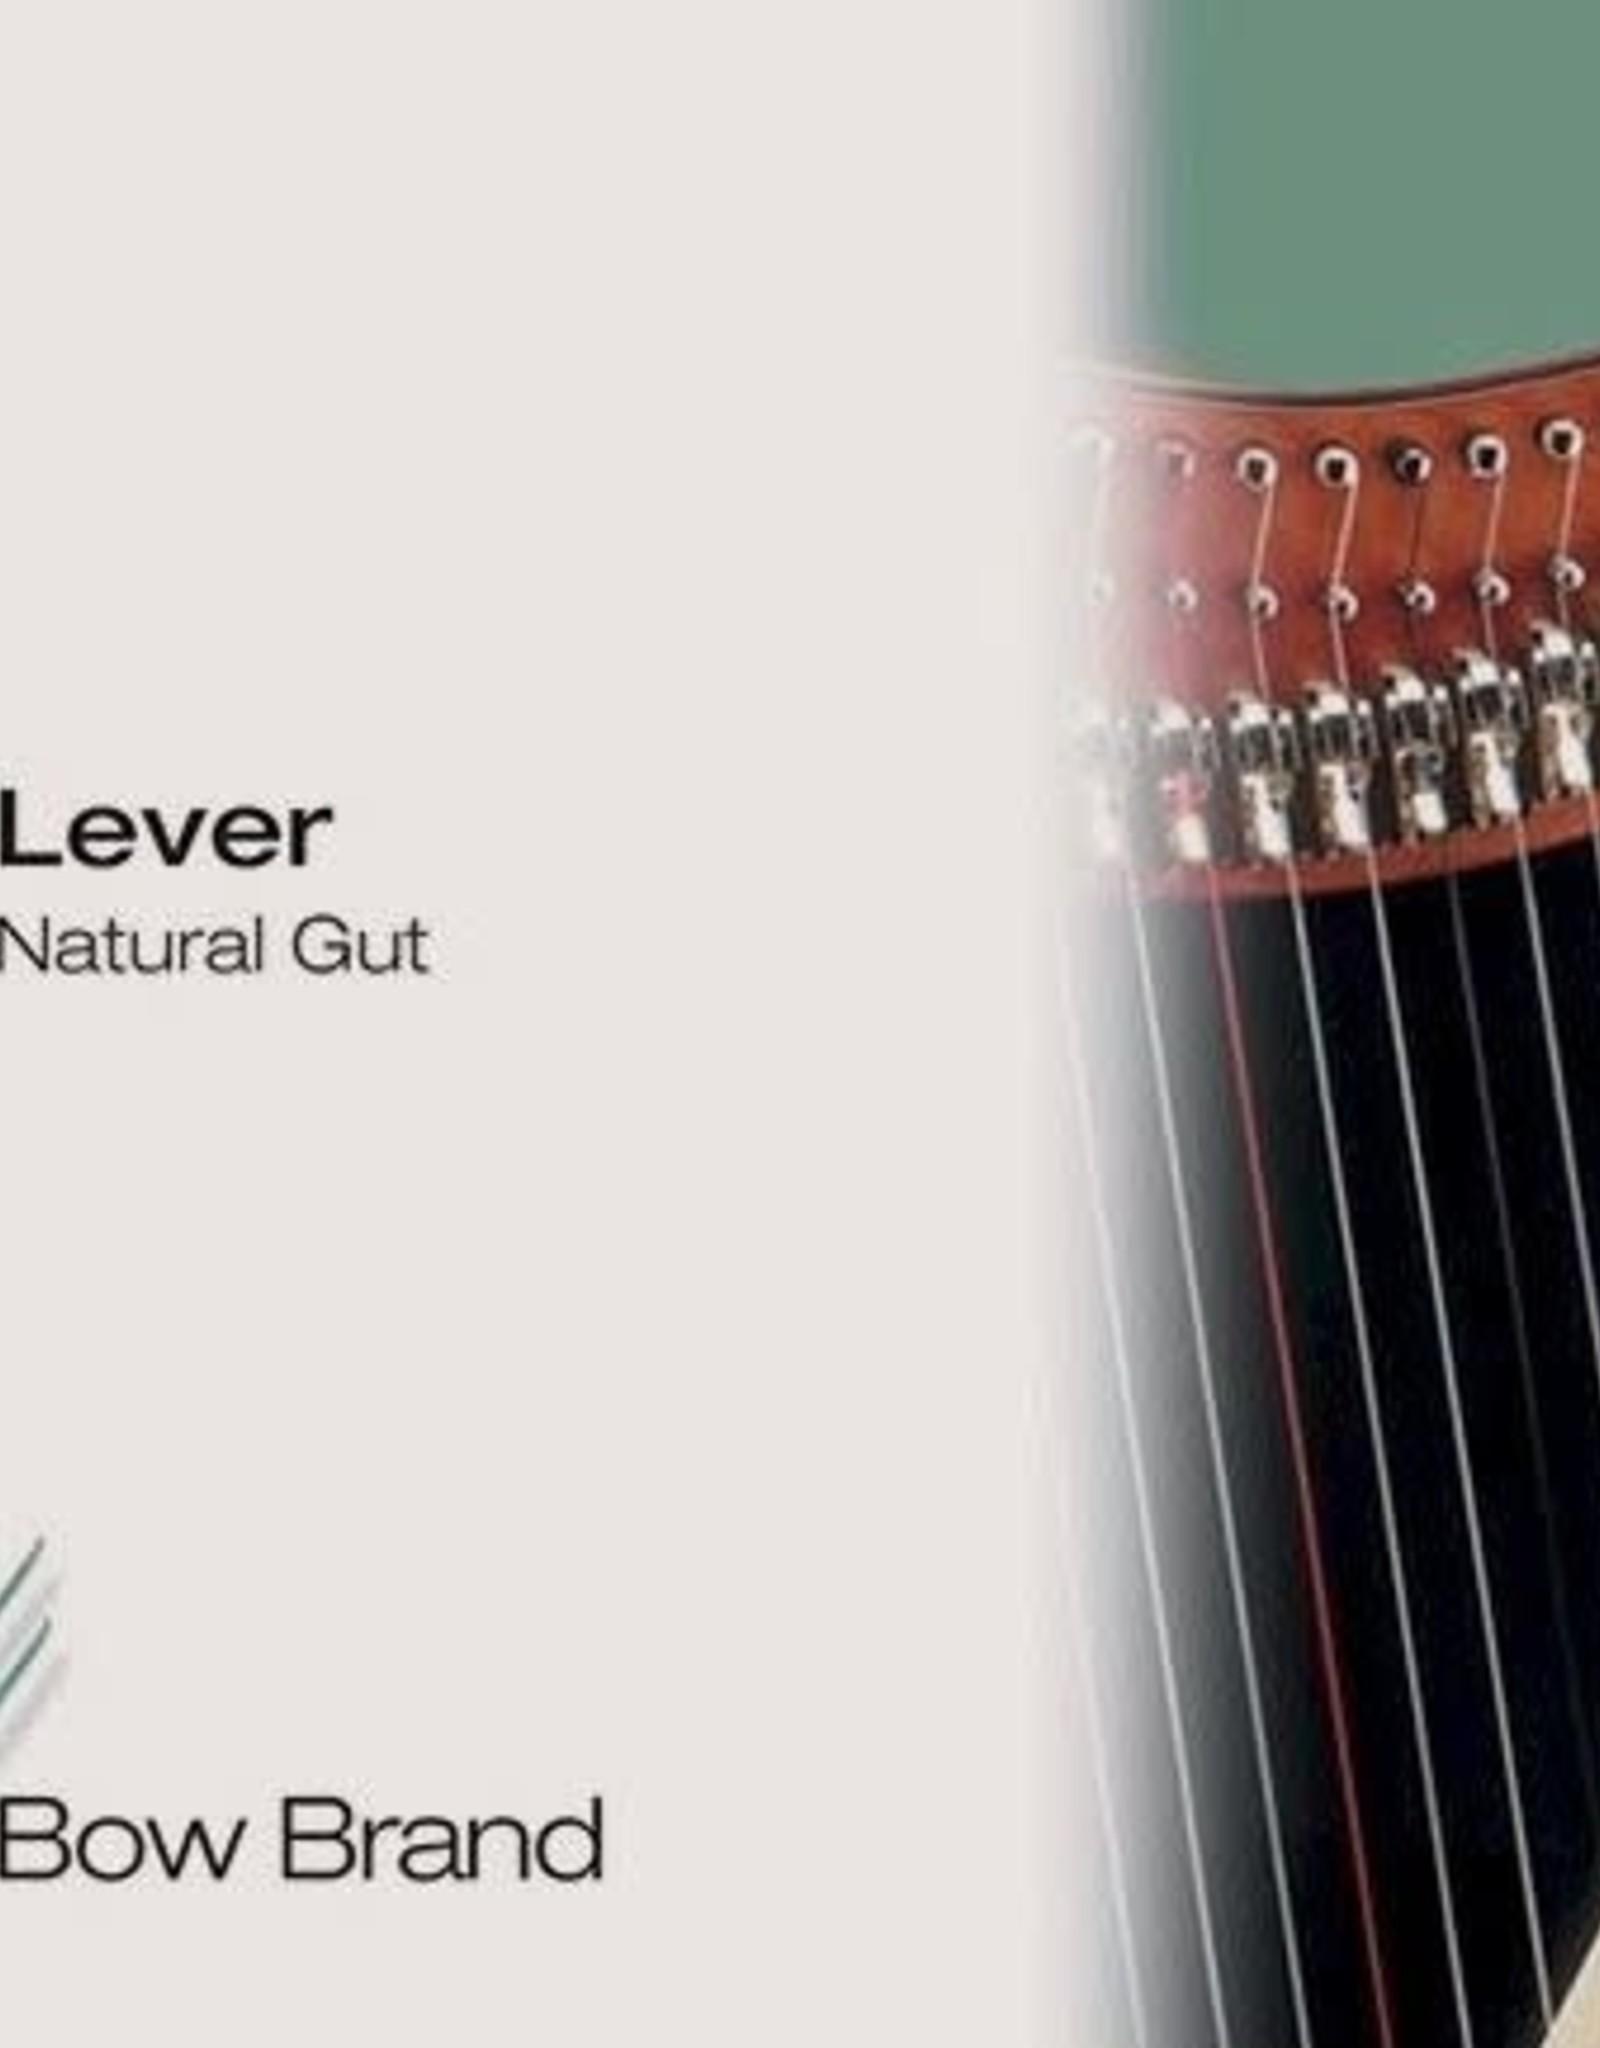 BOW BRAND  klep darm - lever GUT (set) 4de octaaf - inclusief 5% korting